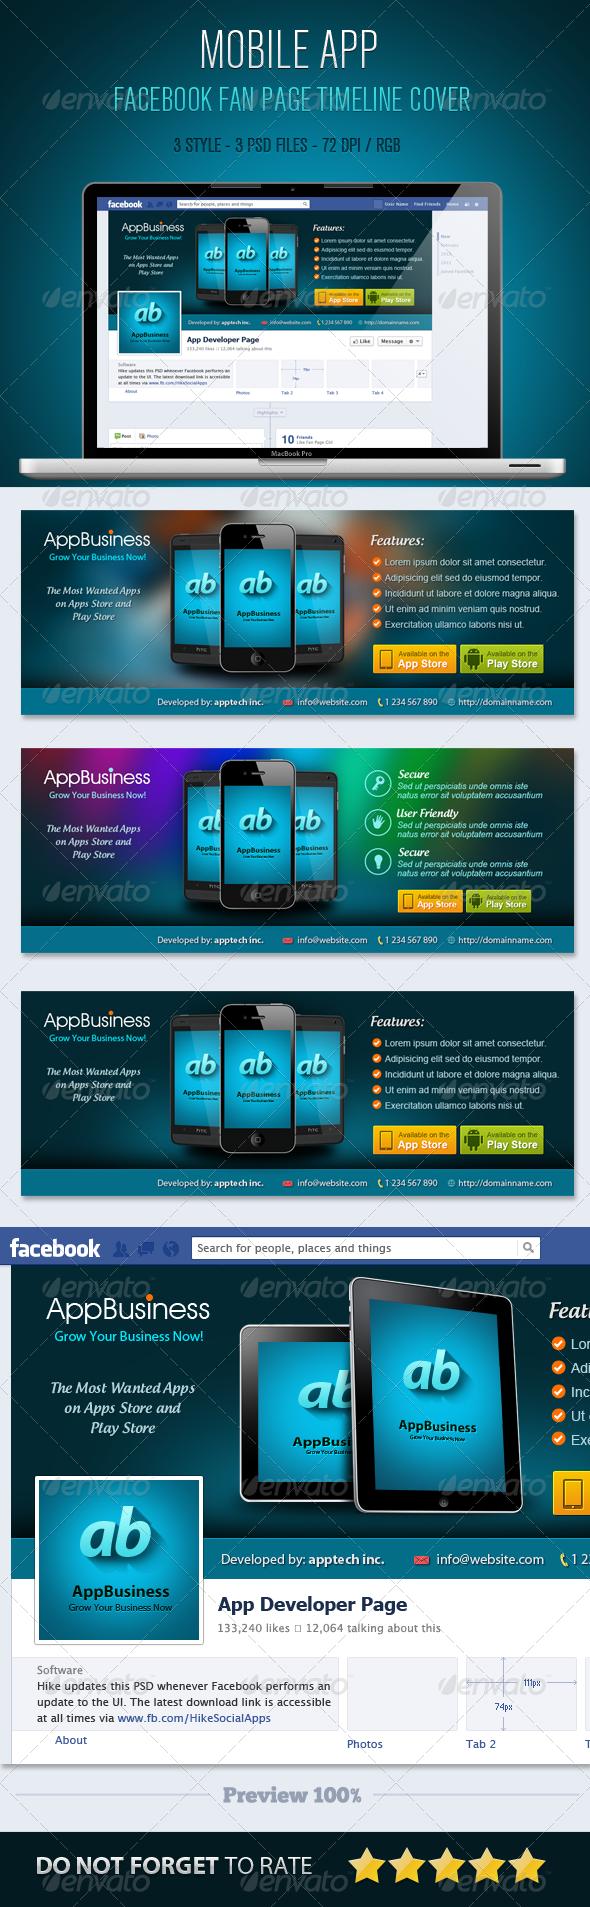 Mobile App Facebook Timeline Cover by myboodesign   GraphicRiver